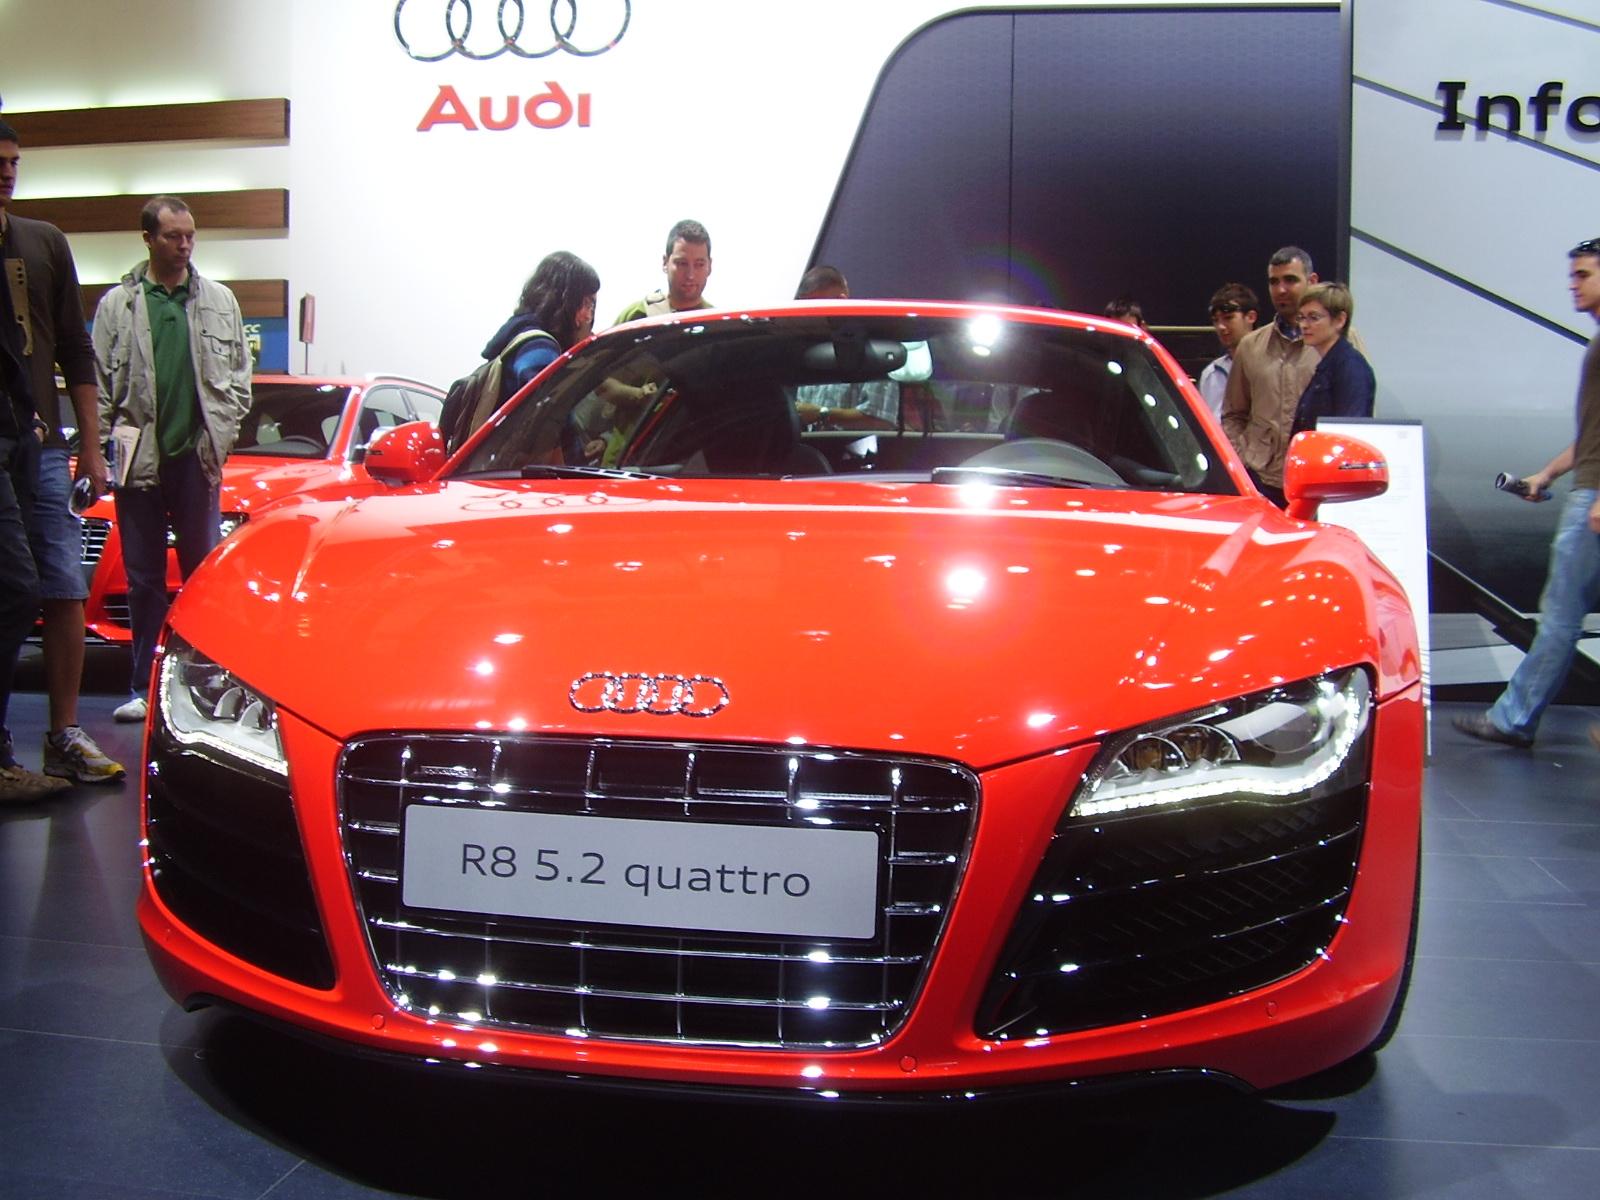 Visita Salon Automovil 09 BCN / Visit to Car Exhibition 09 Barcelona-P5140740.JPG